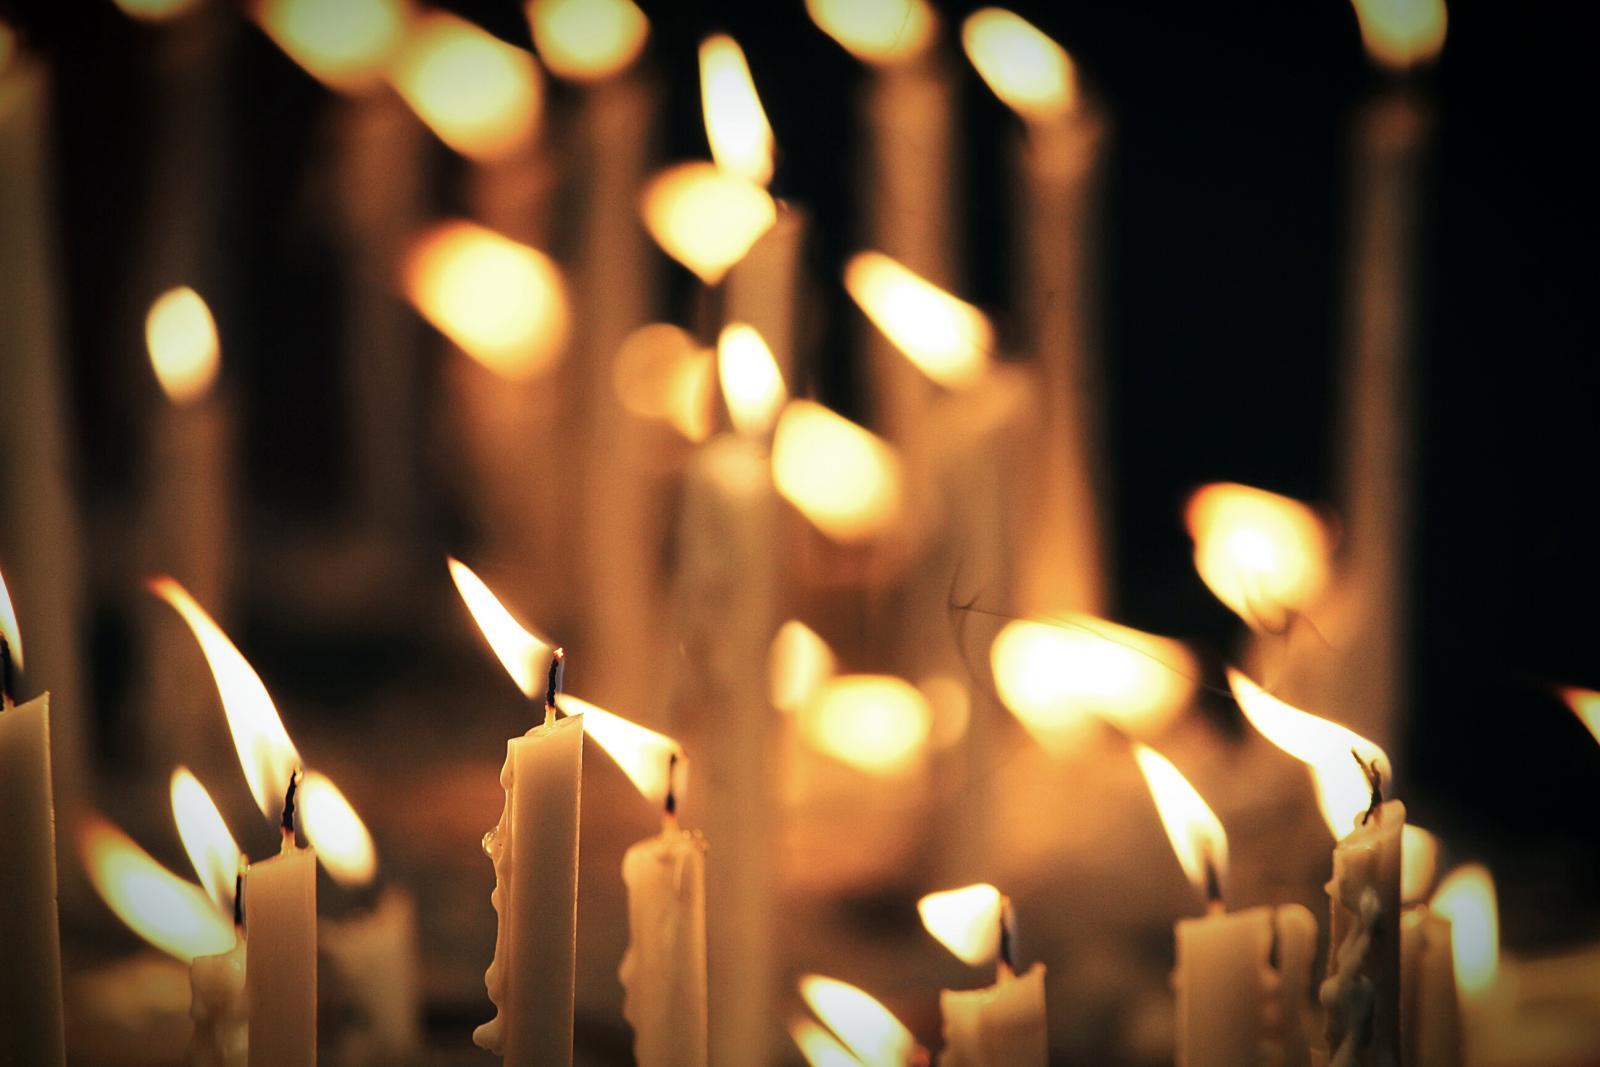 230808-1600x1067-lit_candles